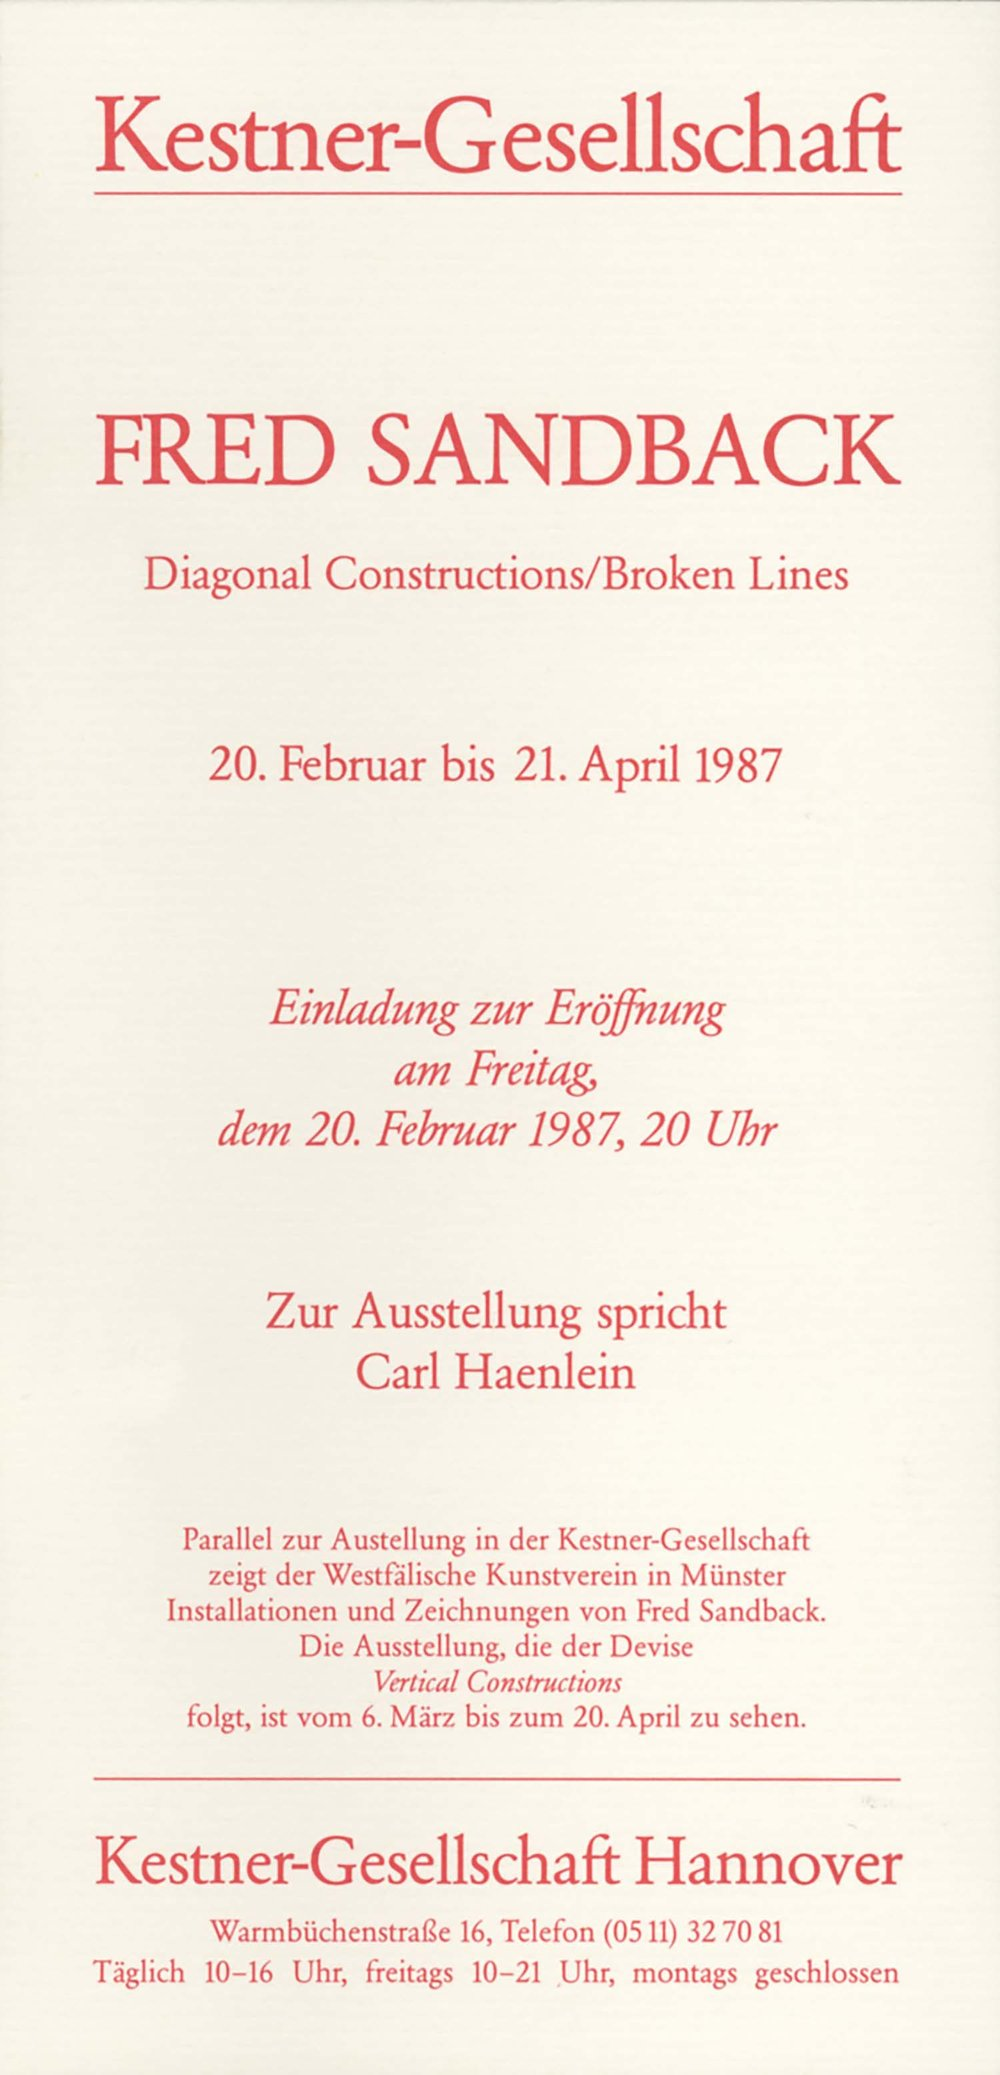 Kestner-Gesellschaft, Hannover, invitation card